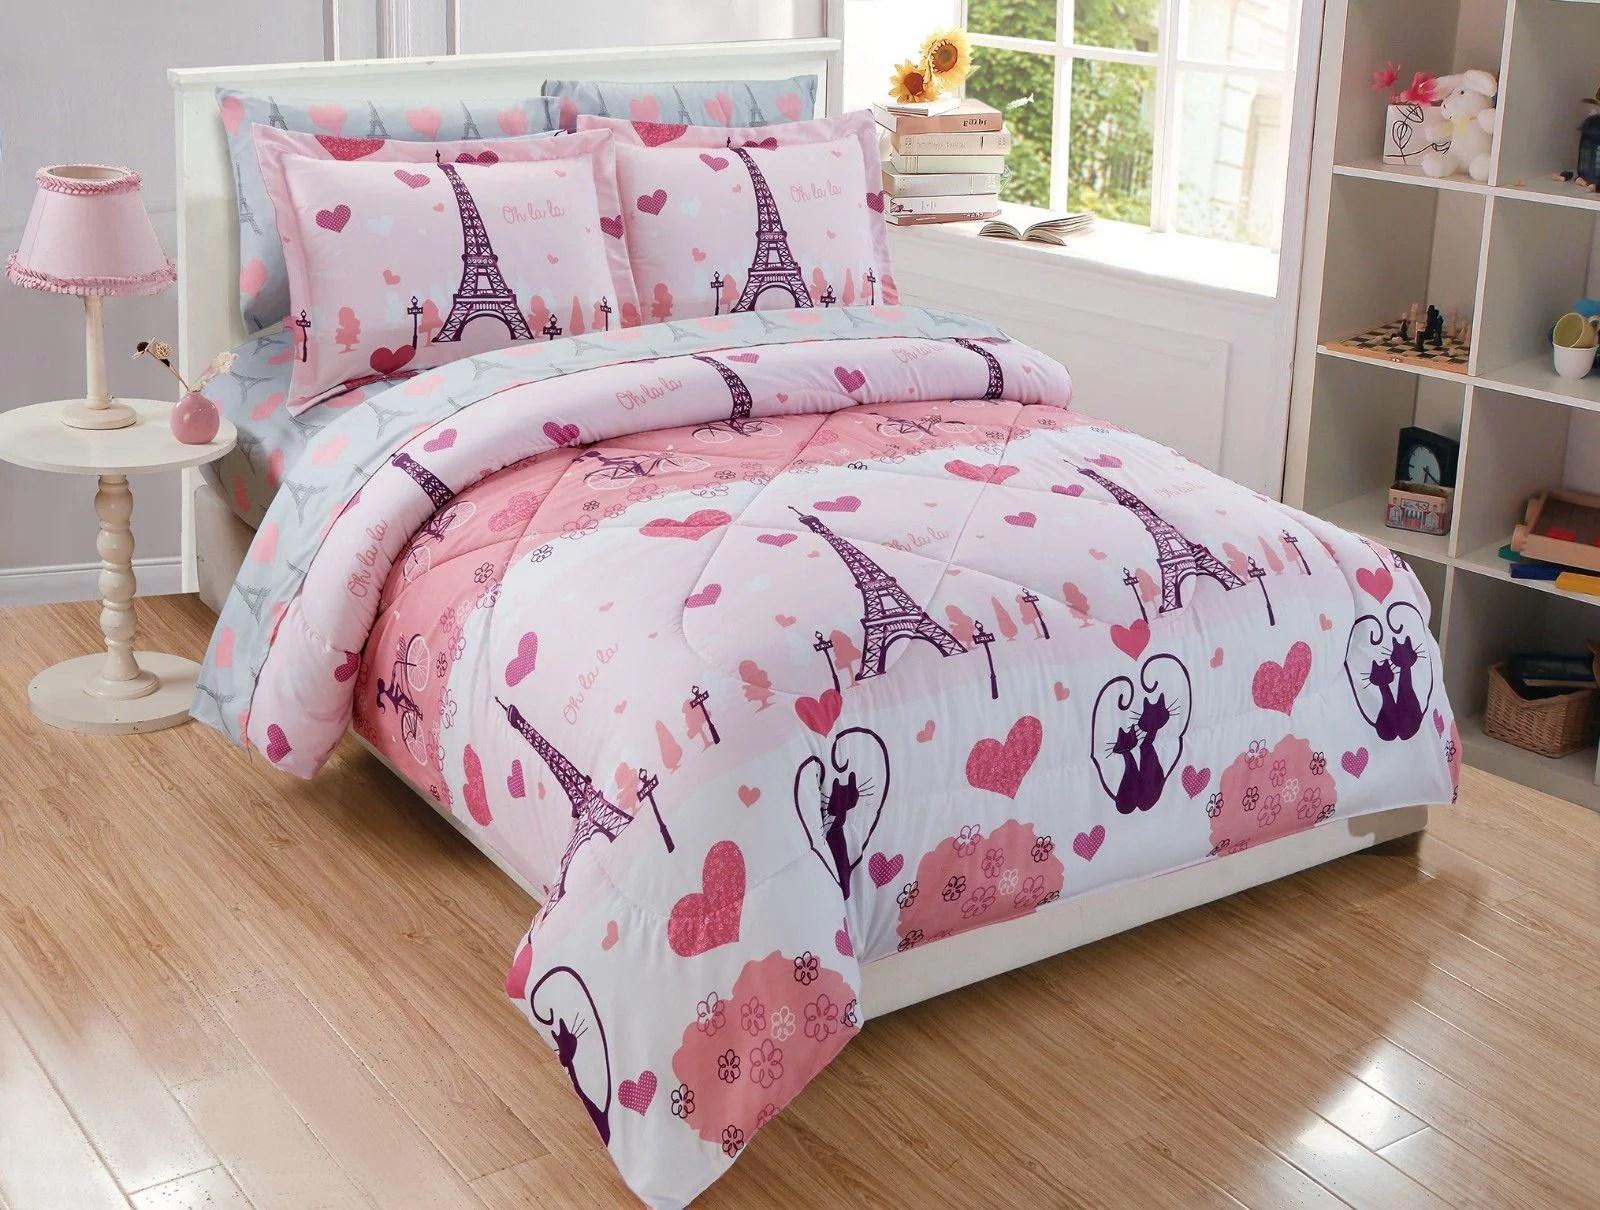 fancy linen 5pc twin size comforter set girls eiffel tower paris hearts pink grey new